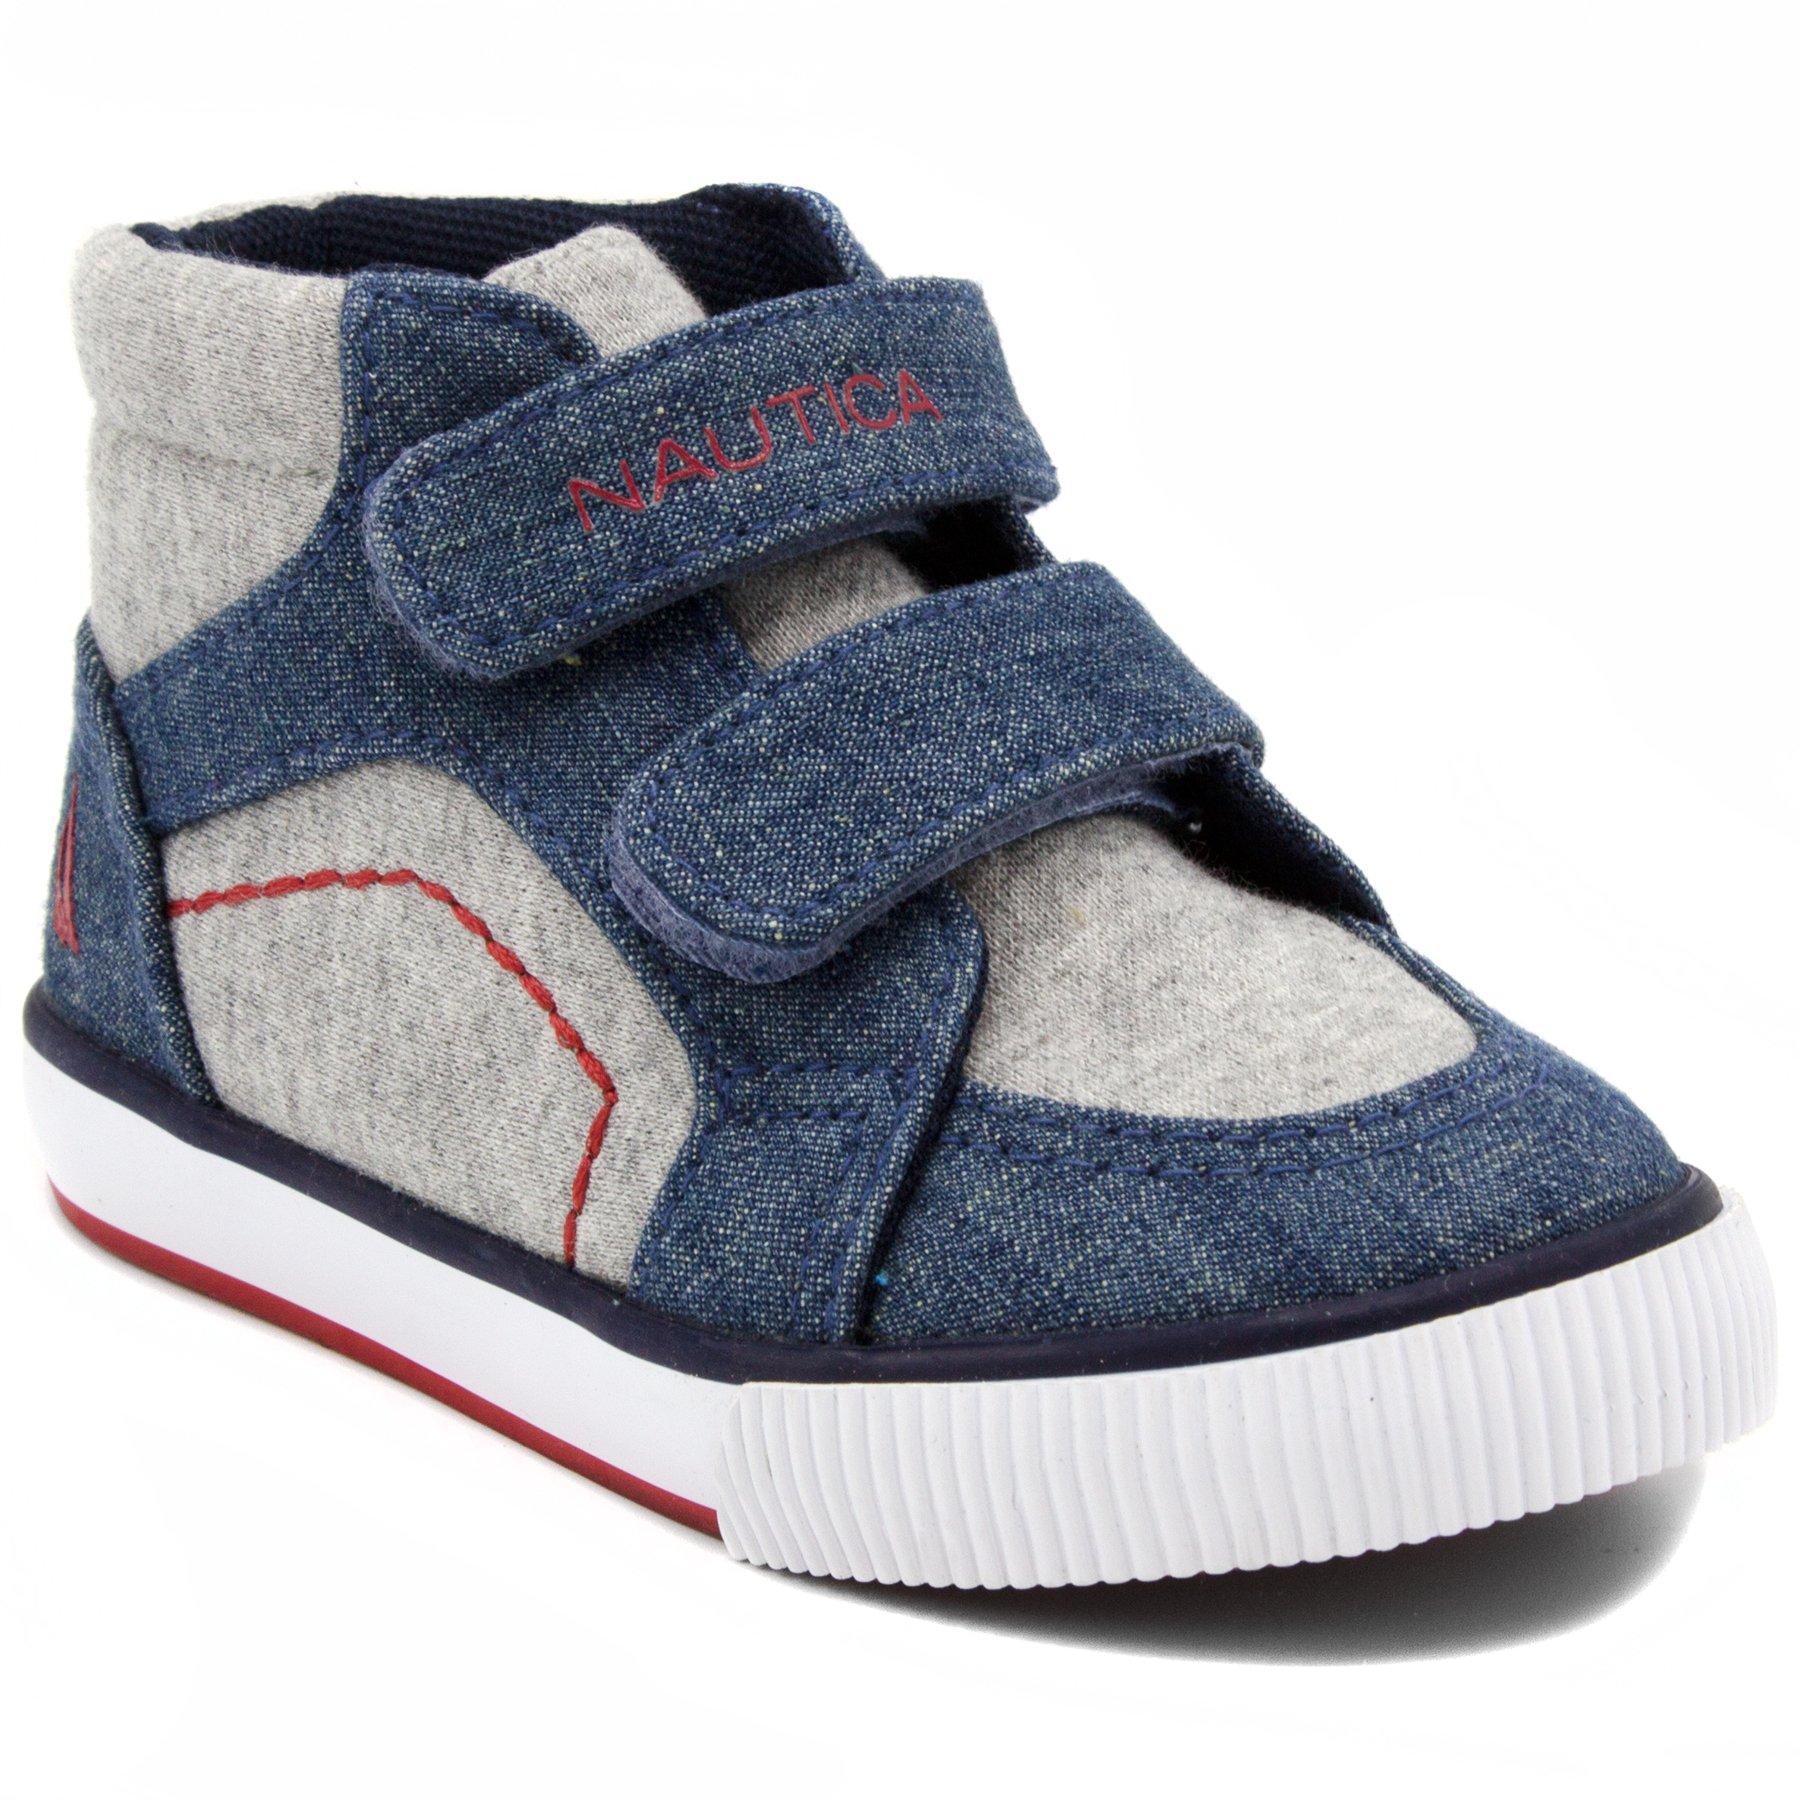 Nautica Kids Rig Canvas Velcro Sneaker Fashion Shoe Boot Like High Top -Denim/Grey-6